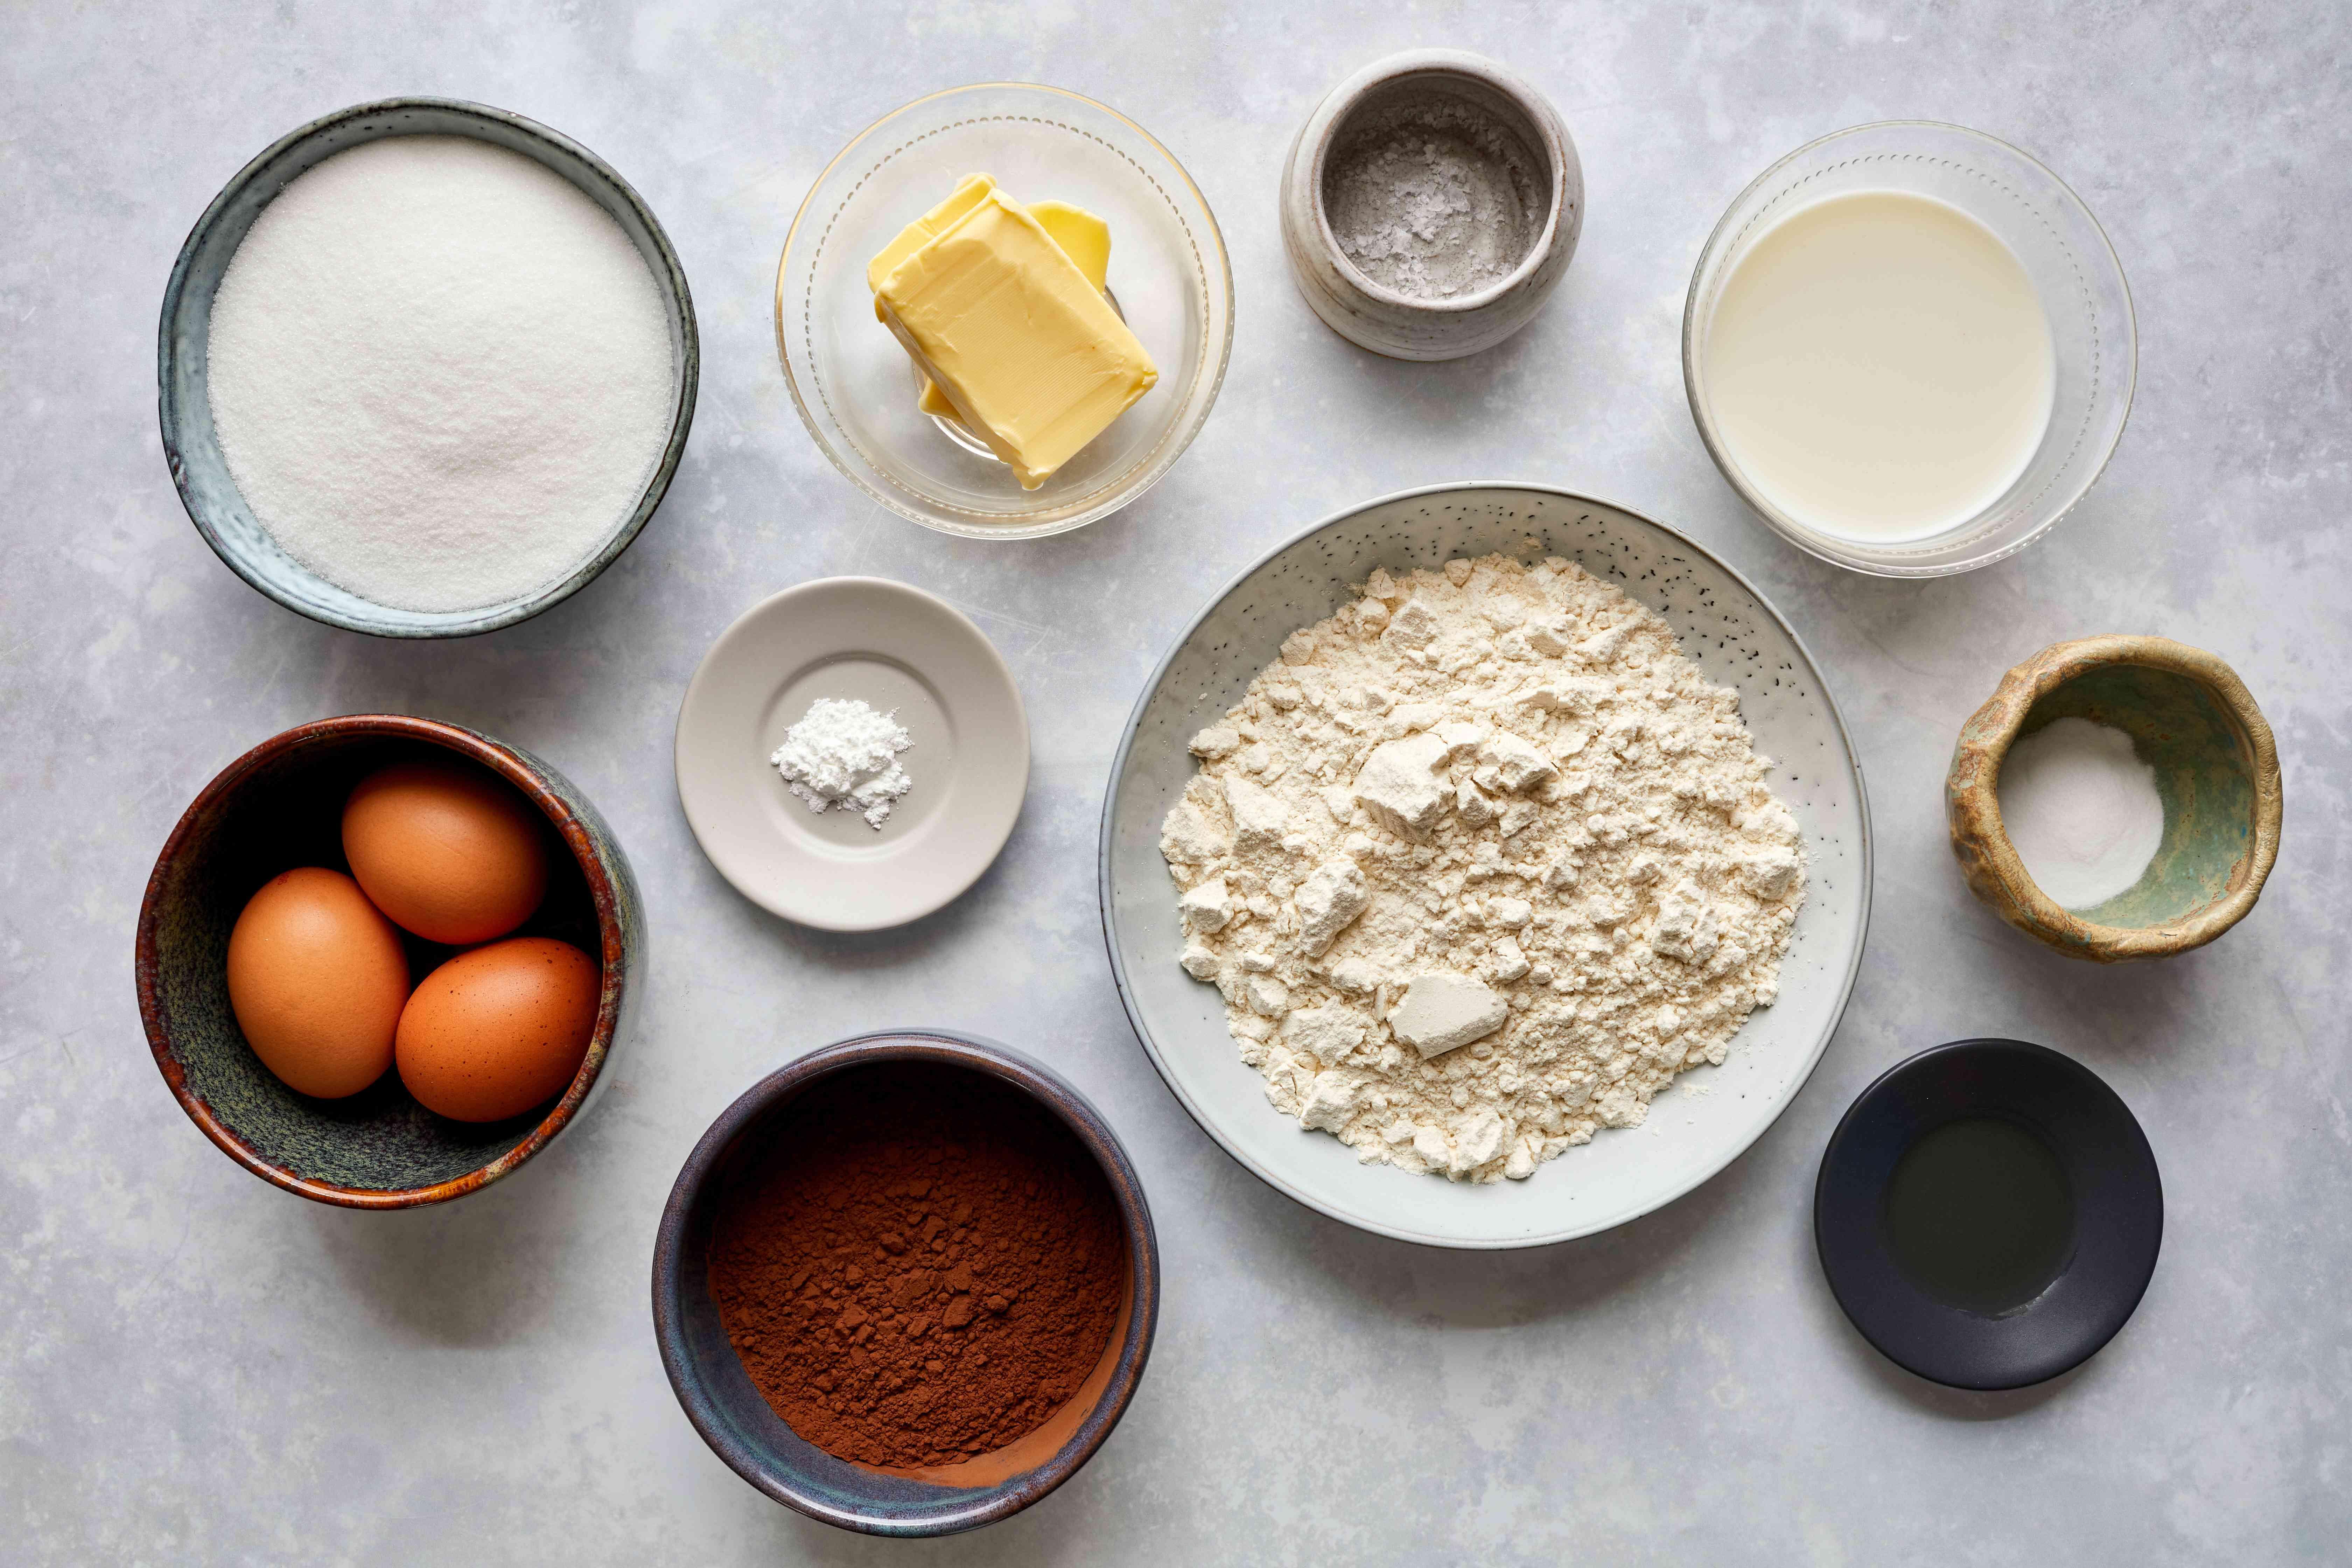 Chocolate Loaf Cake With Easy Chocolate Glaze ingredients, flour, eggs, butter, sugar, salt, baking soda, baking powder, cocoa powder, milk, vanilla extract, salt